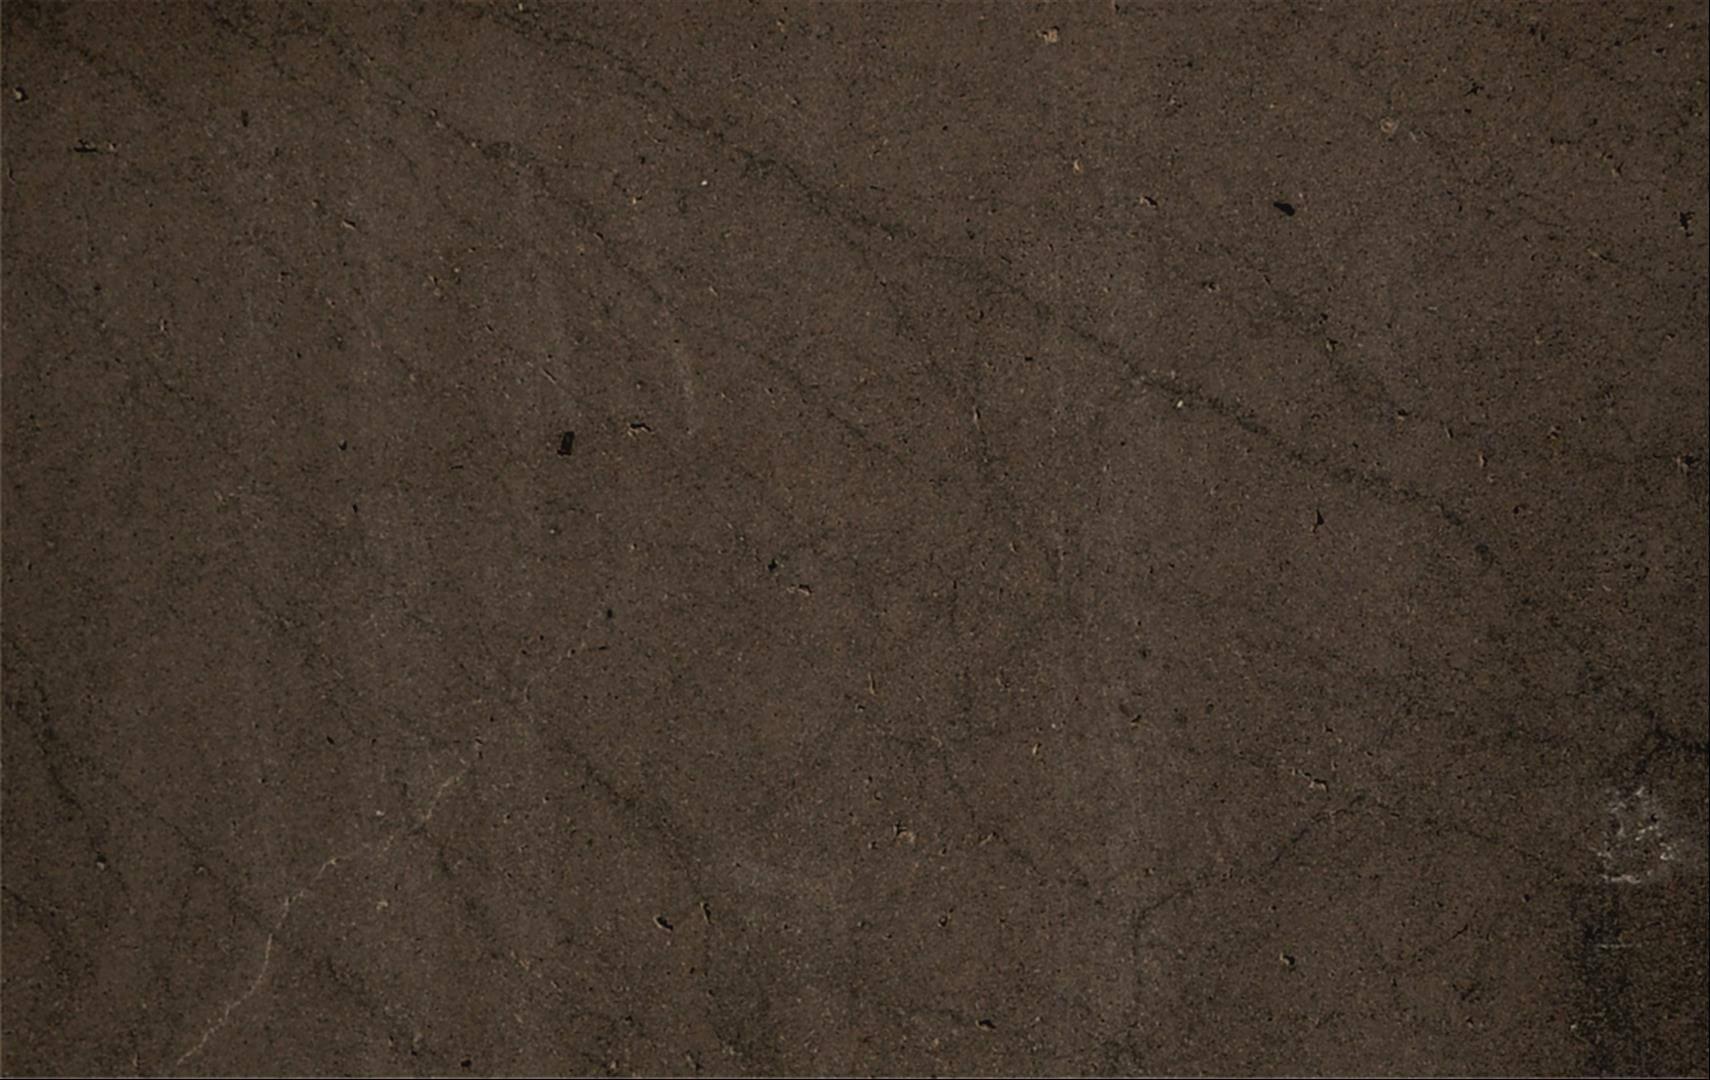 Red Andesite Stone-Nigella